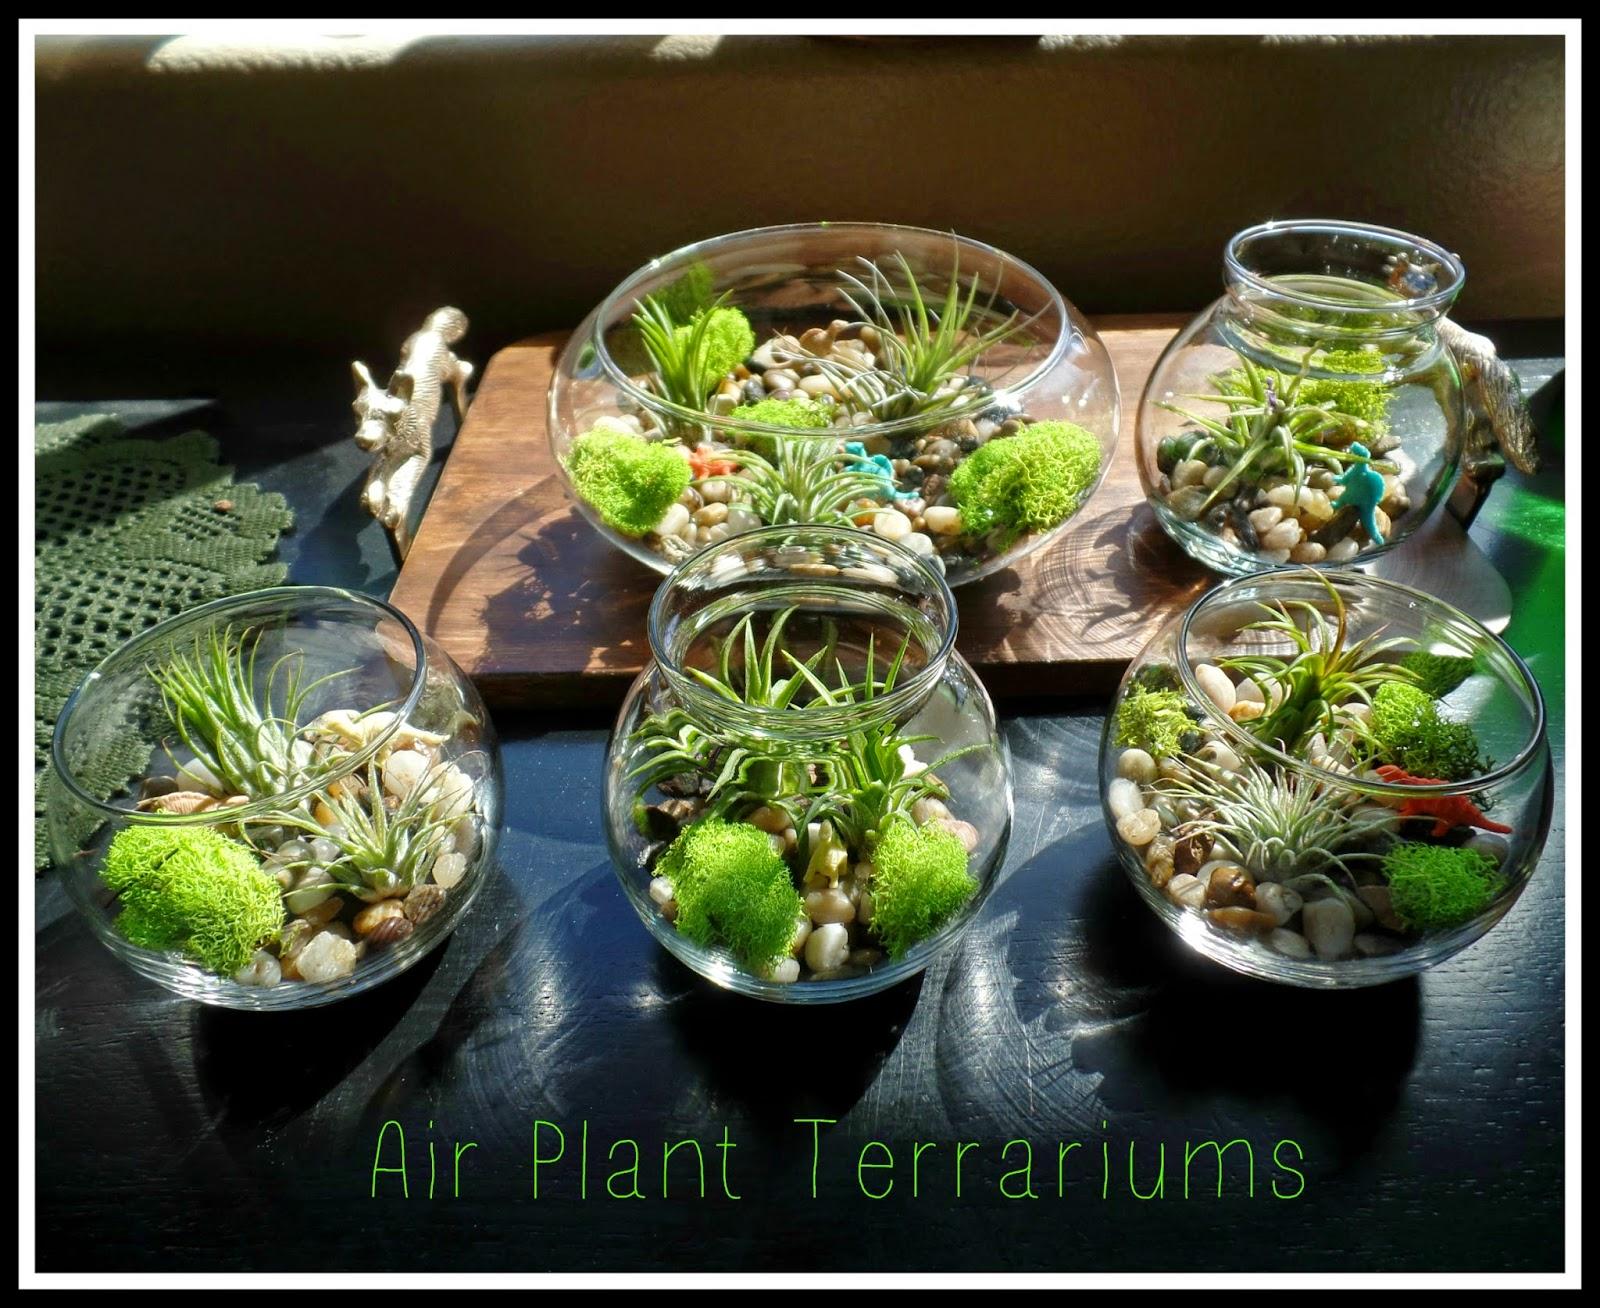 April S Homemaking Halloween Air Plant Terrarium